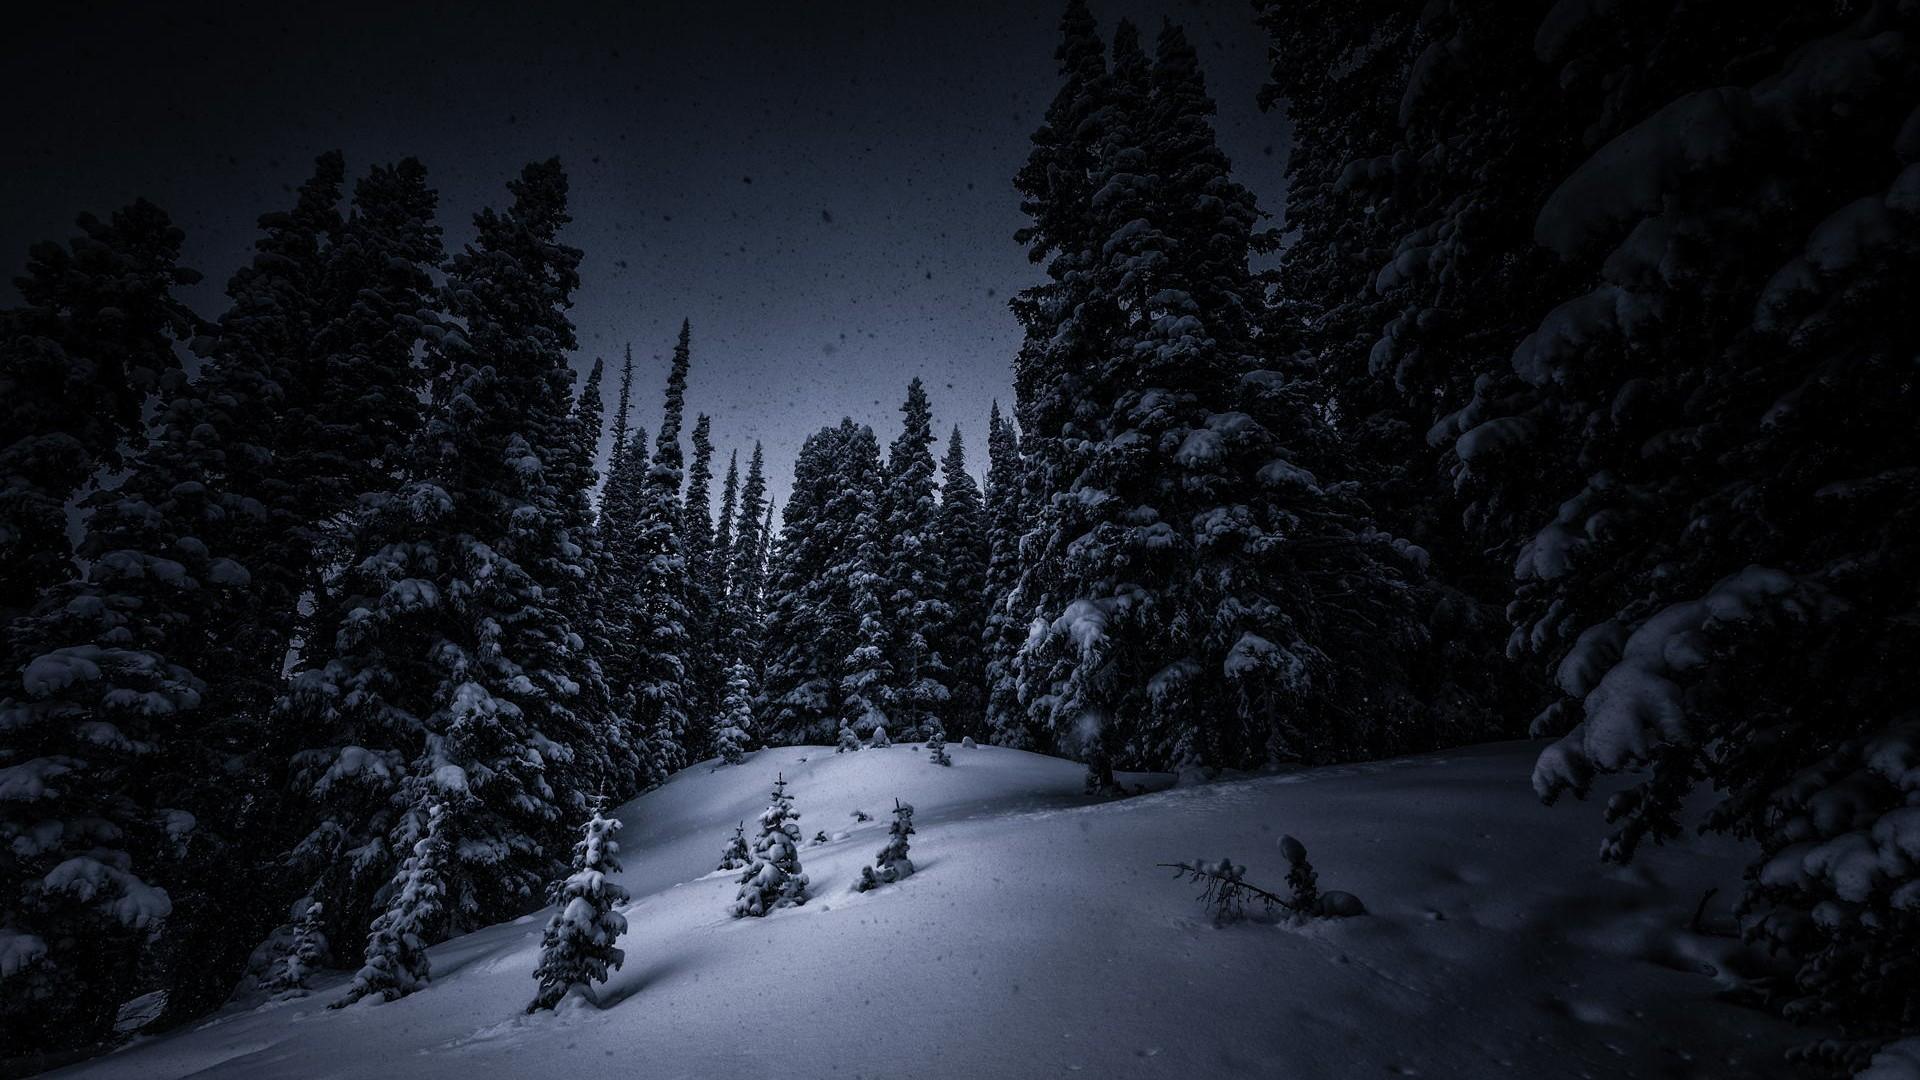 Thomas Kinkade Fall Desktop Wallpaper Dark Woods Hd Backgrounds Pixelstalk Net